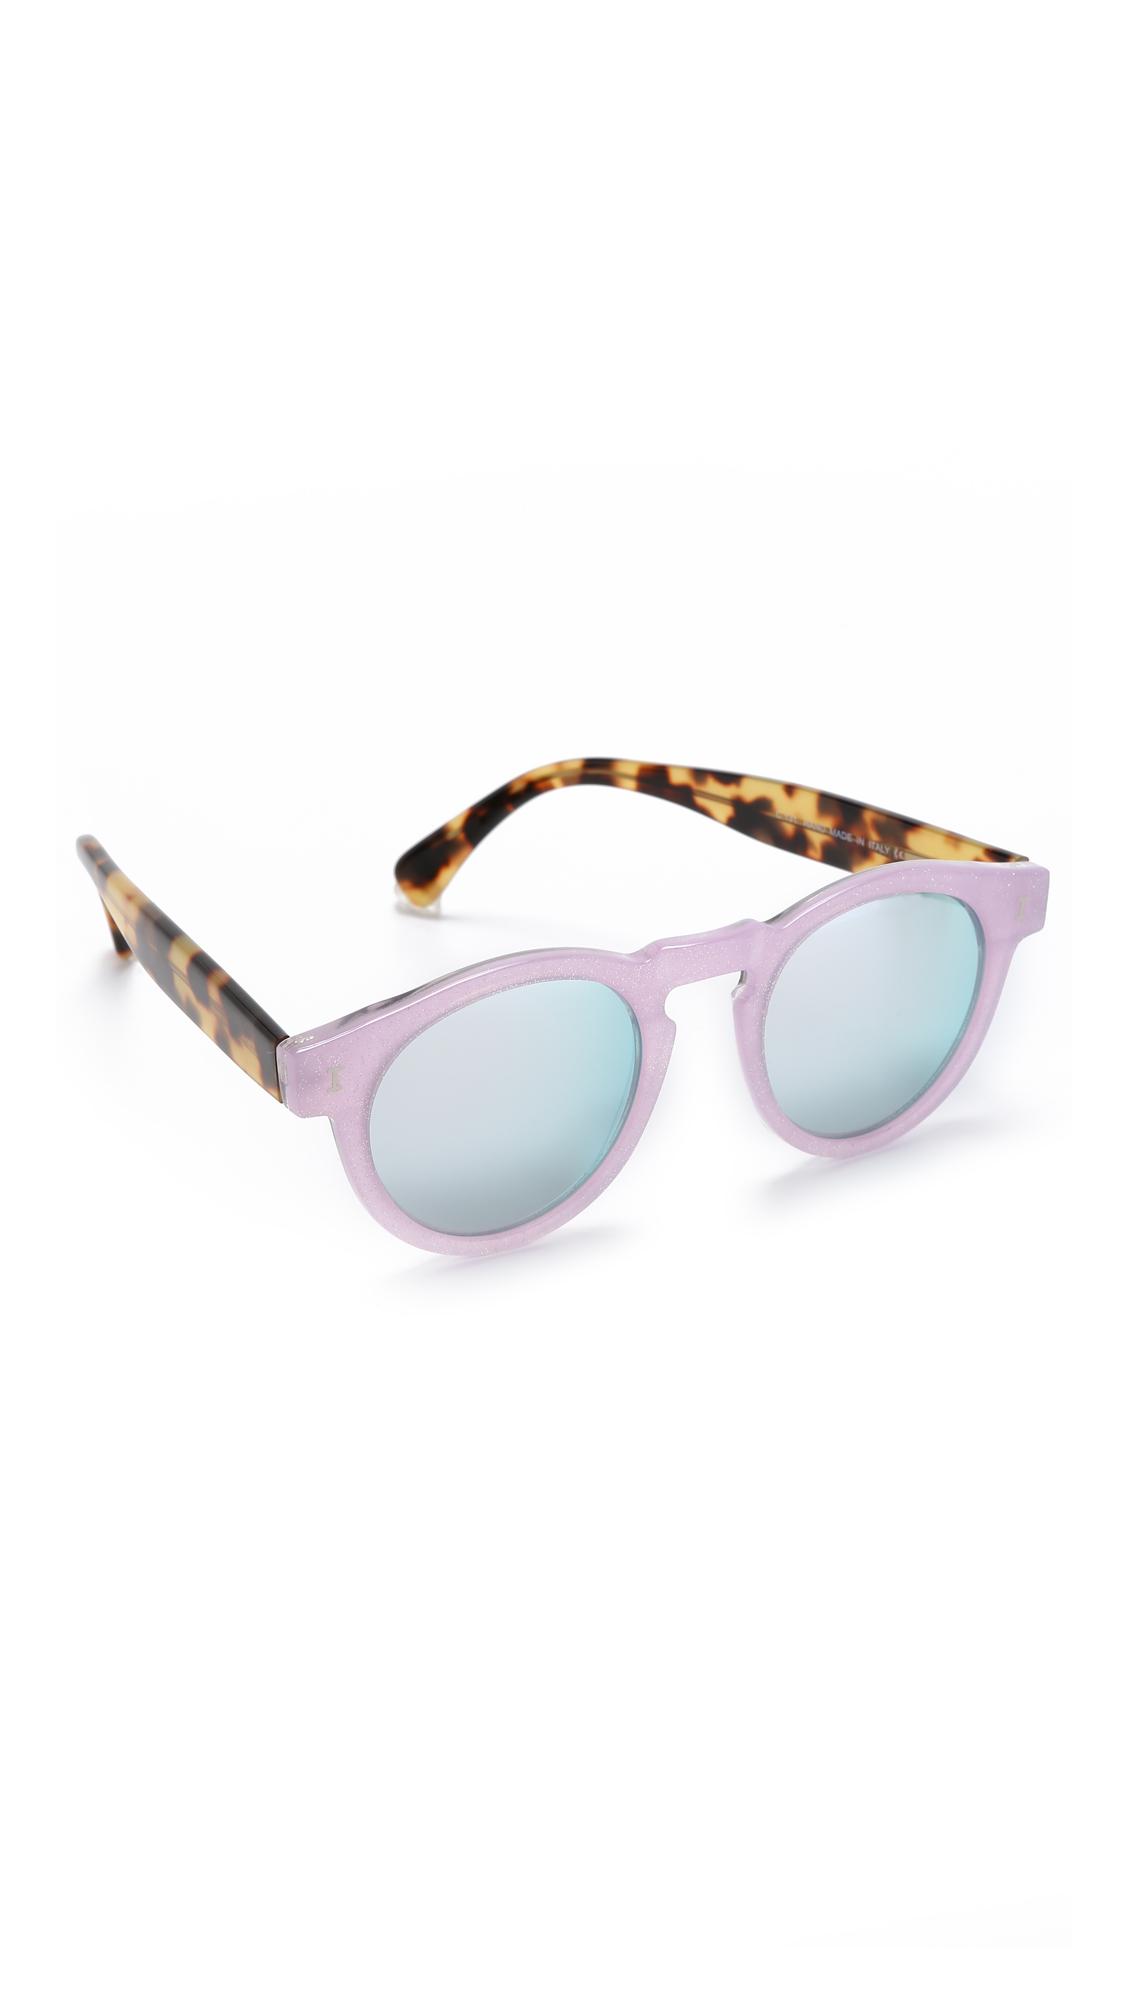 d1492f7f6bb Lyst - Illesteva Leonard Sparkle Mirrored Sunglasses - Pink Sparkle ...